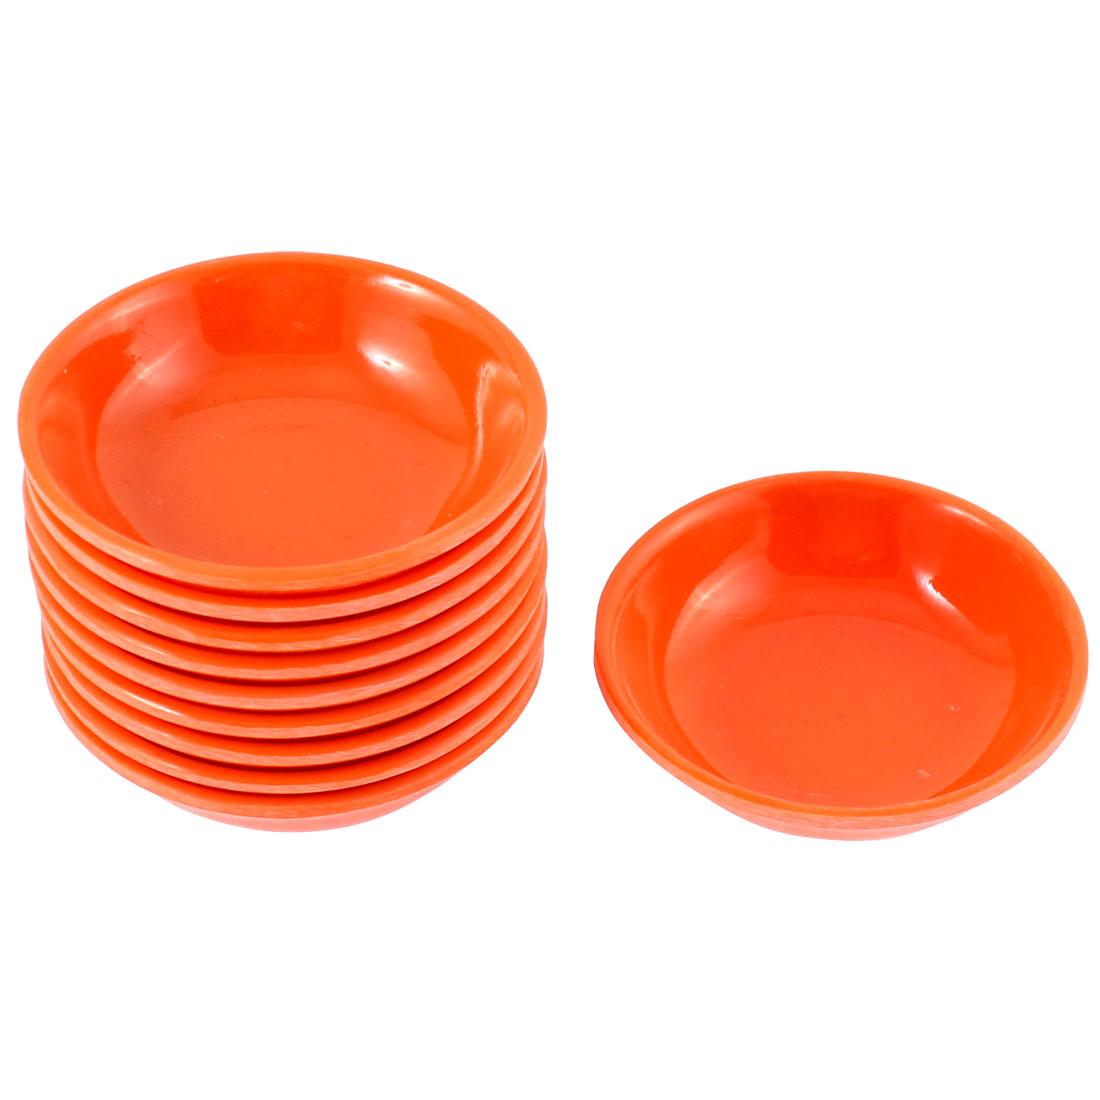 Kitchen Sushi Soy Sauce Wasabi Dipping Dishes Plate Bowl Orange 10 Pcs